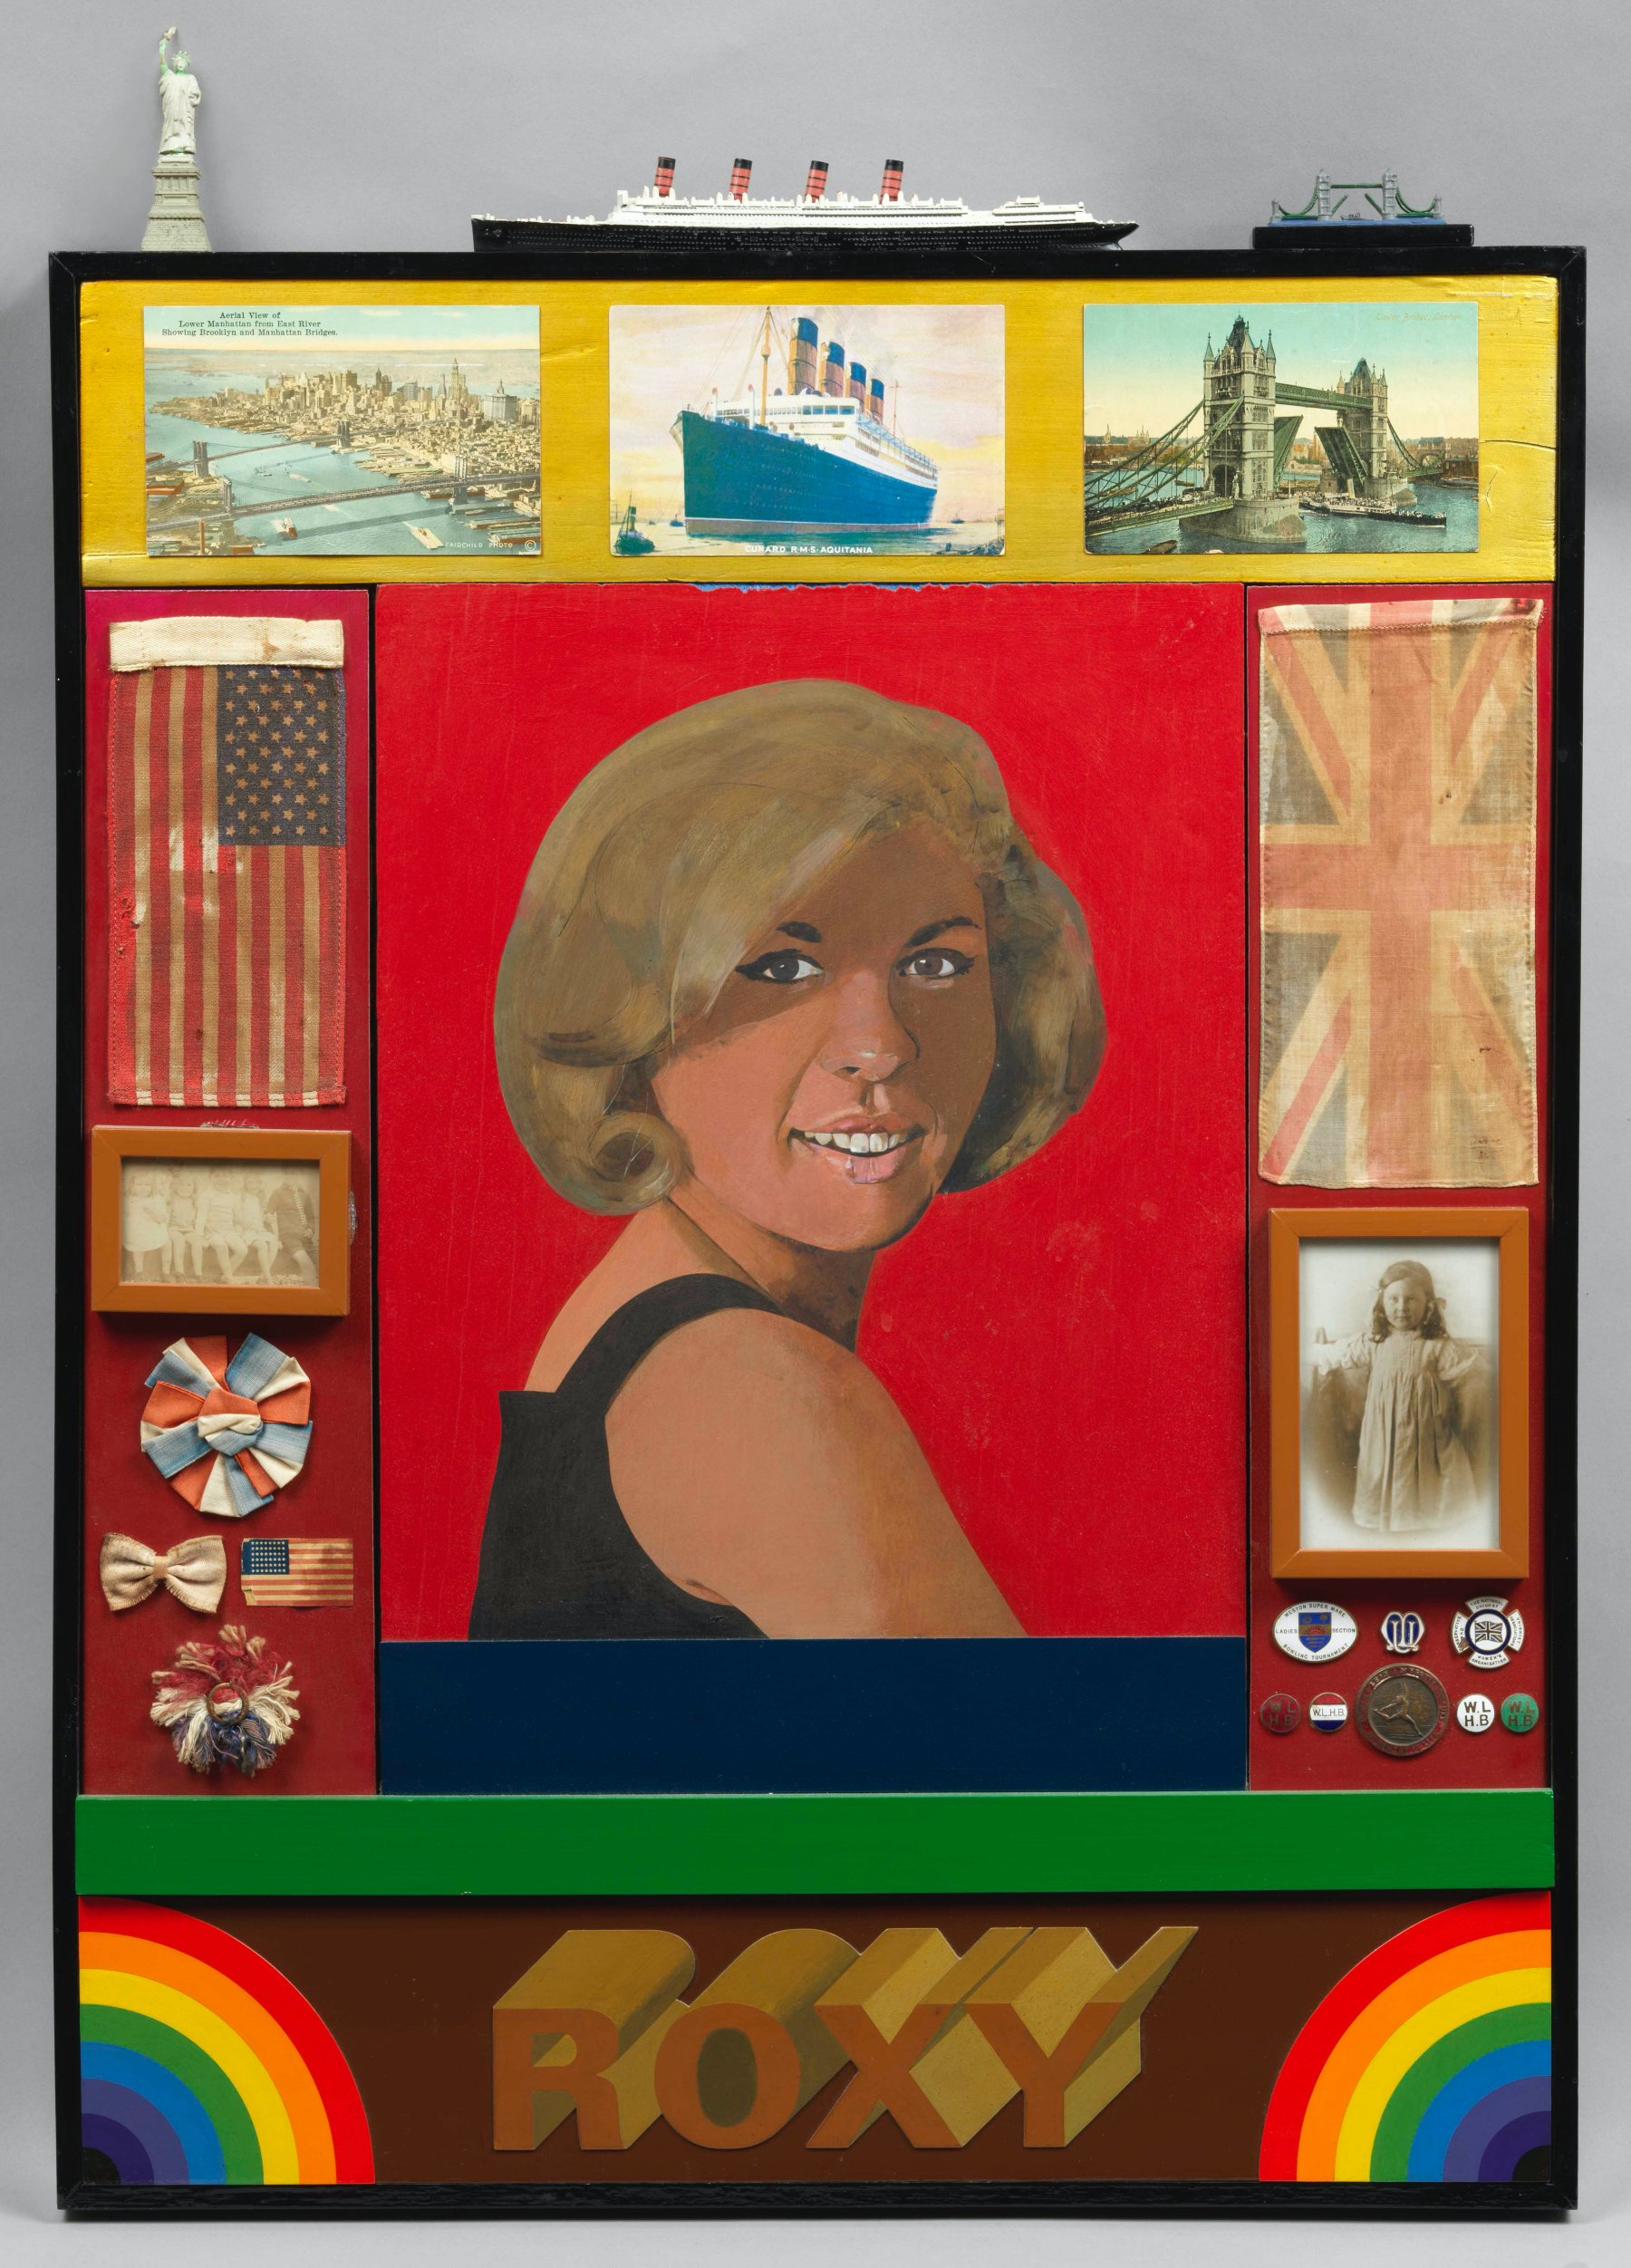 Hazlitt Holland-Hibbert, Peter Blake, Roxy Roxy, 1965-1983